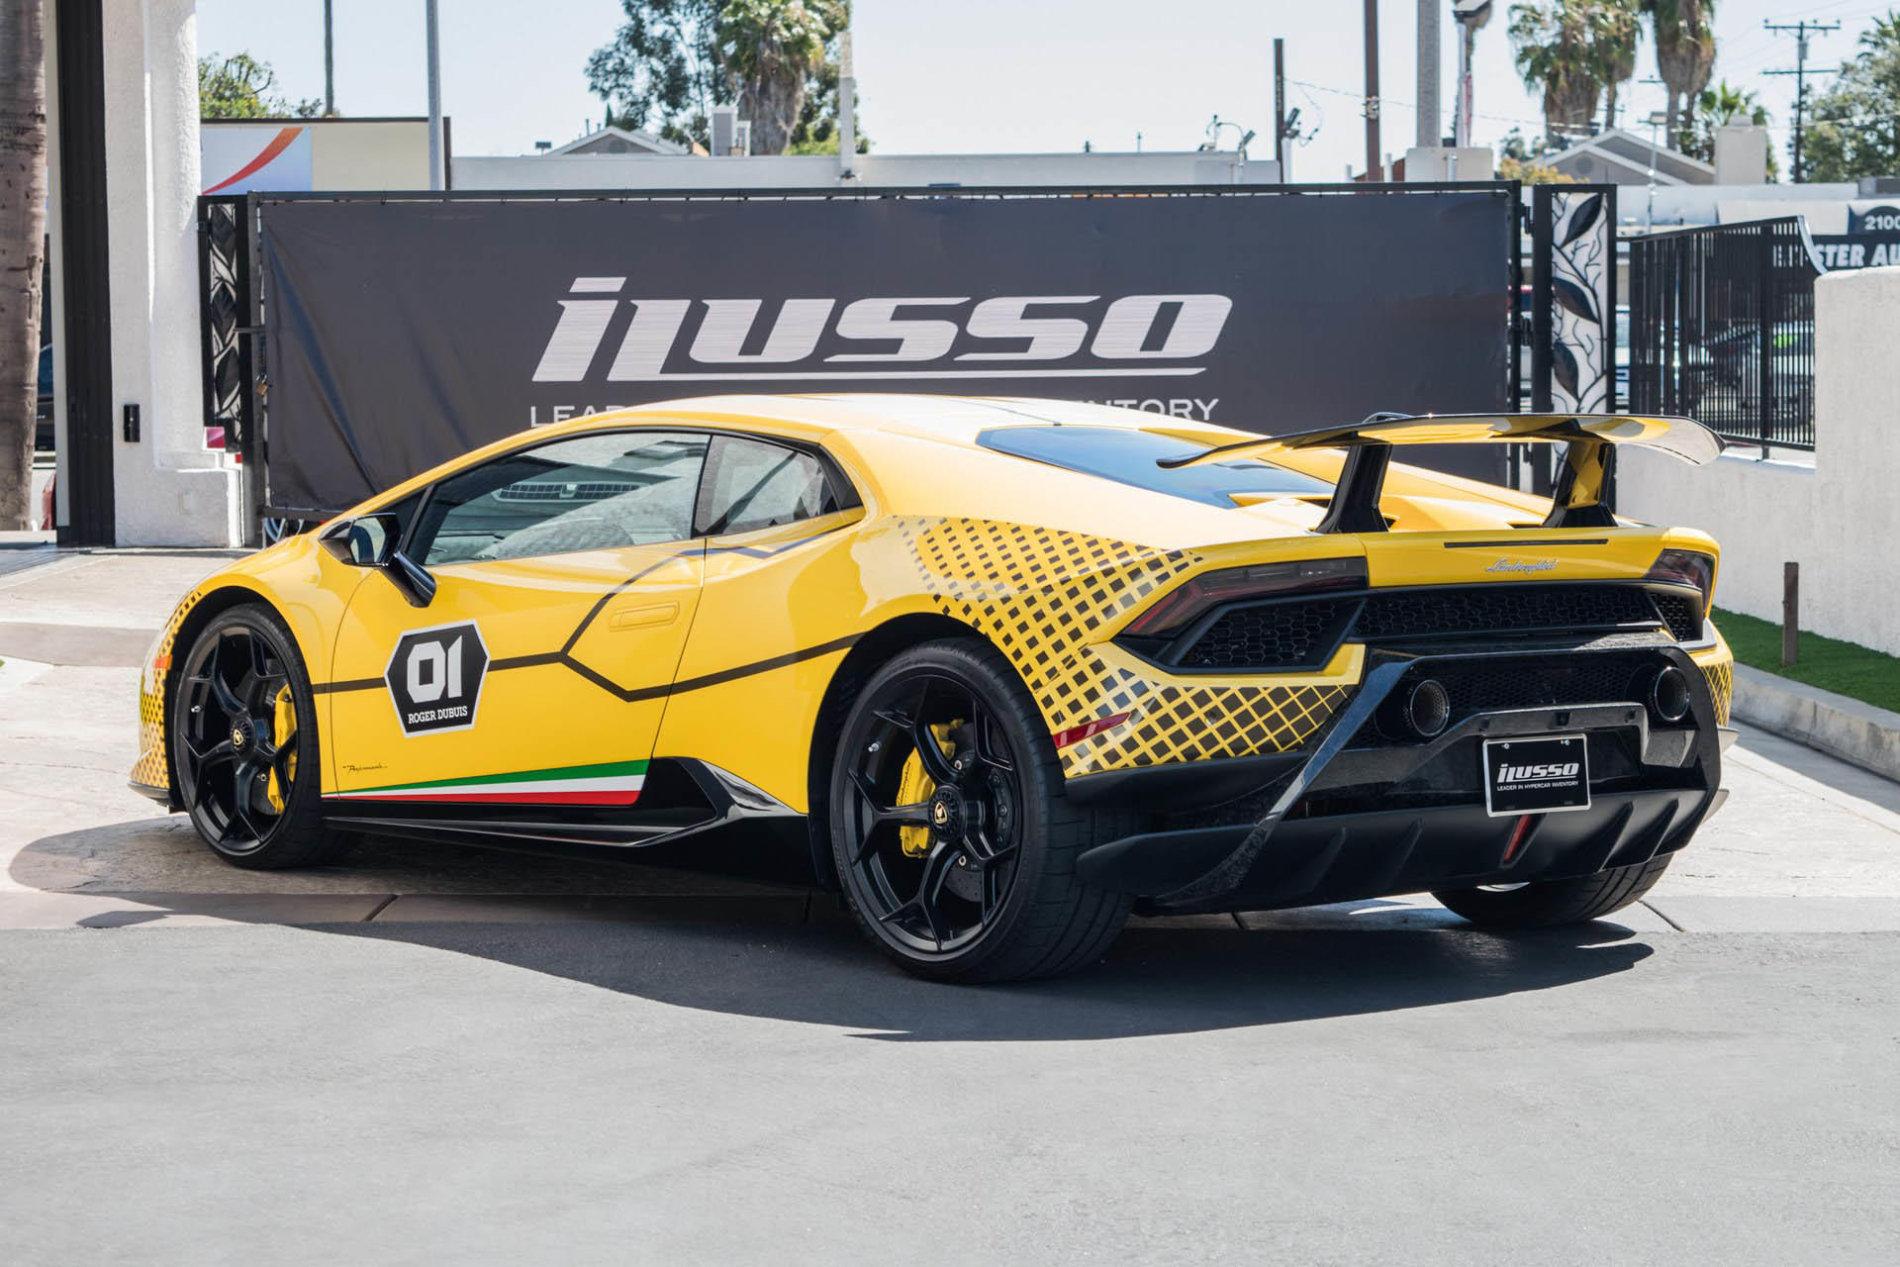 Lamborghini Huracan Performante de vanzare - Lamborghini Huracan Performante de vanzare